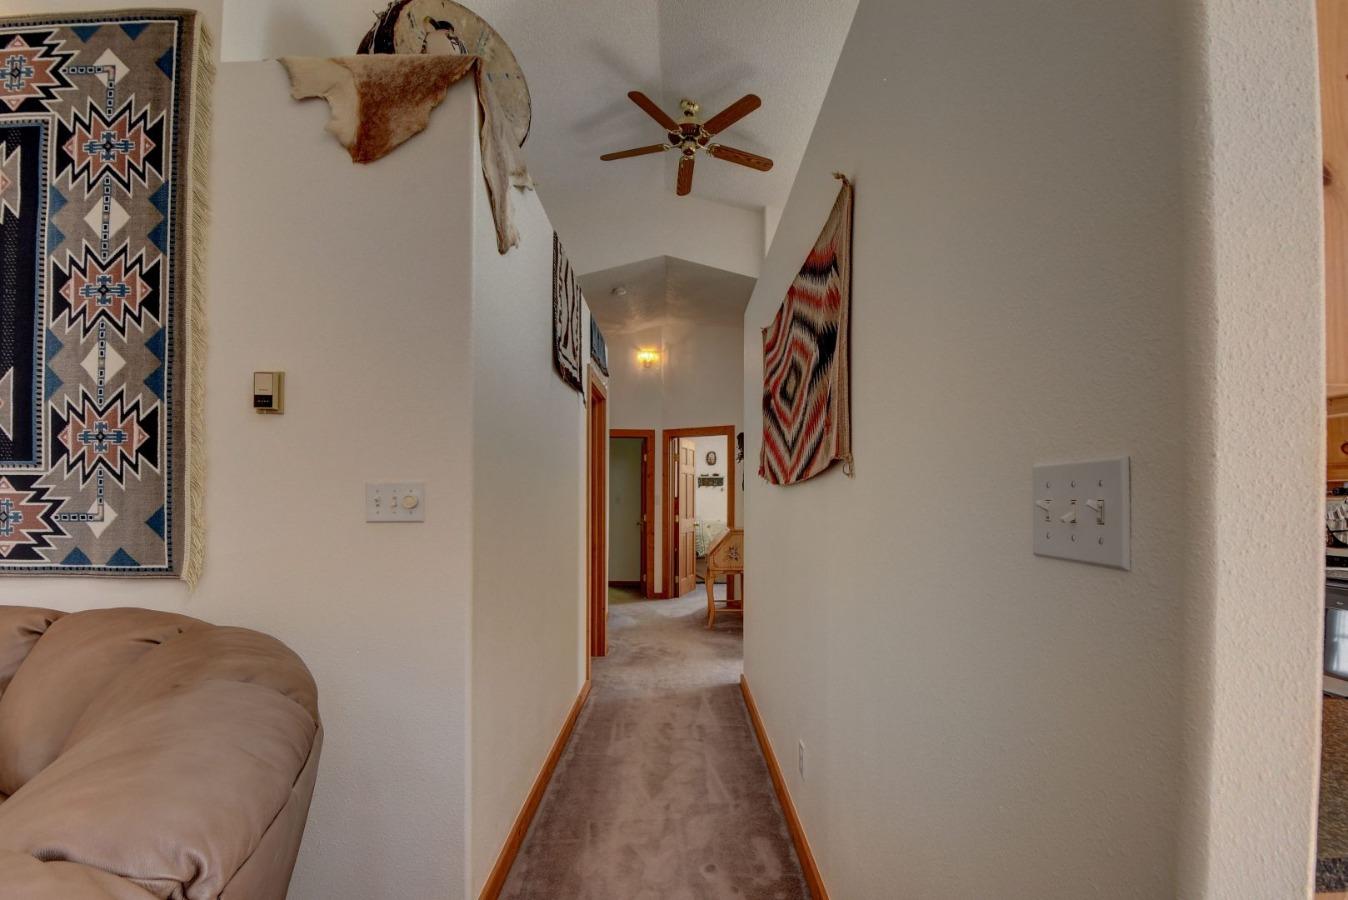 Hallway to bedrooms and bath